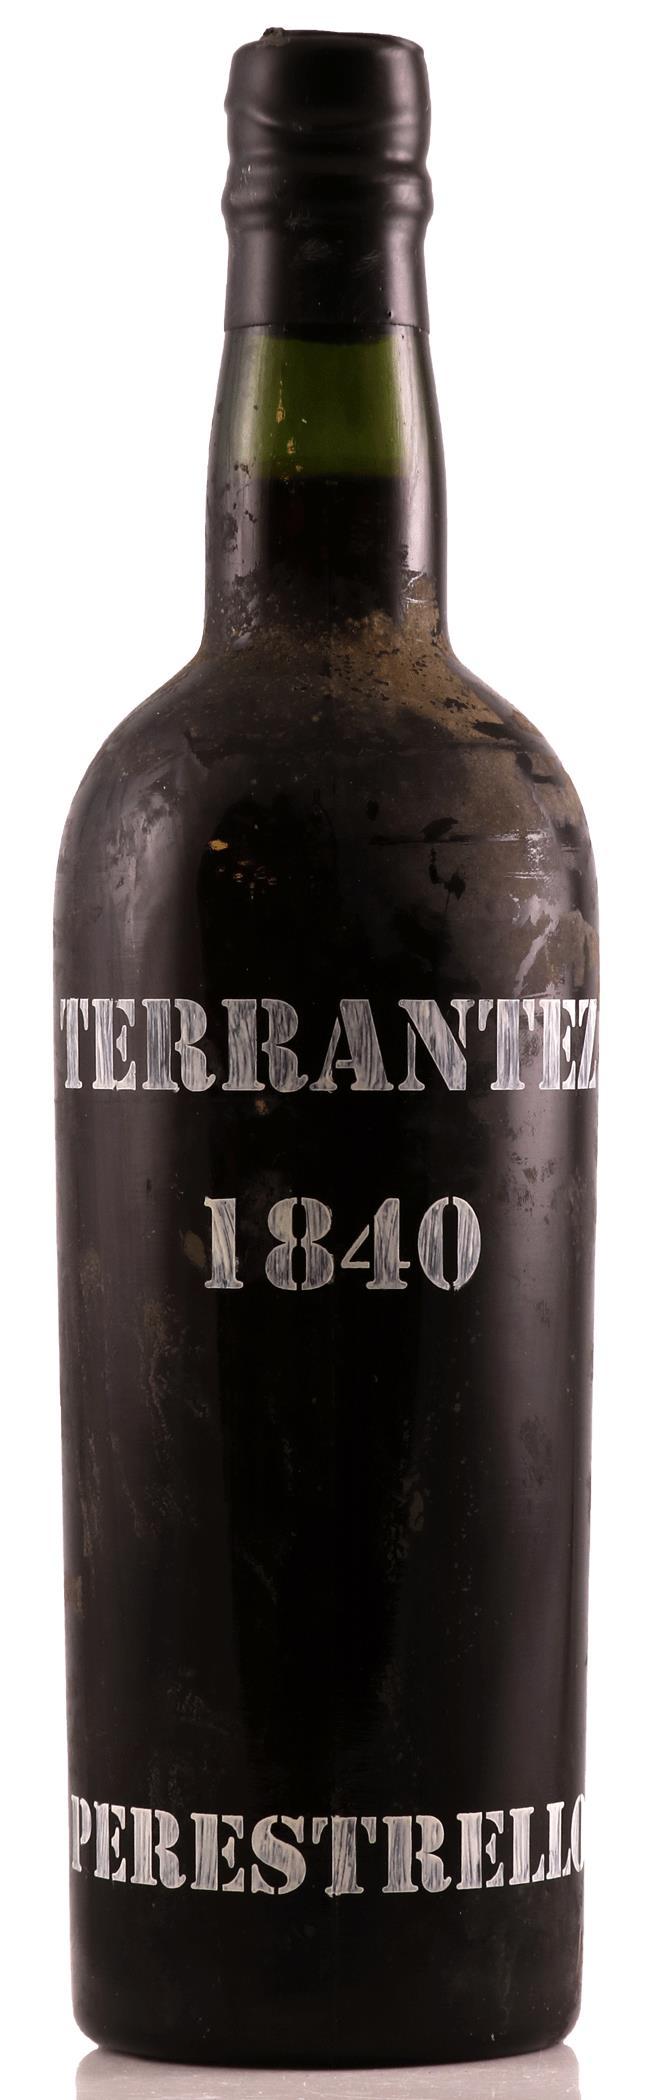 Madeira 1840 Perestrello